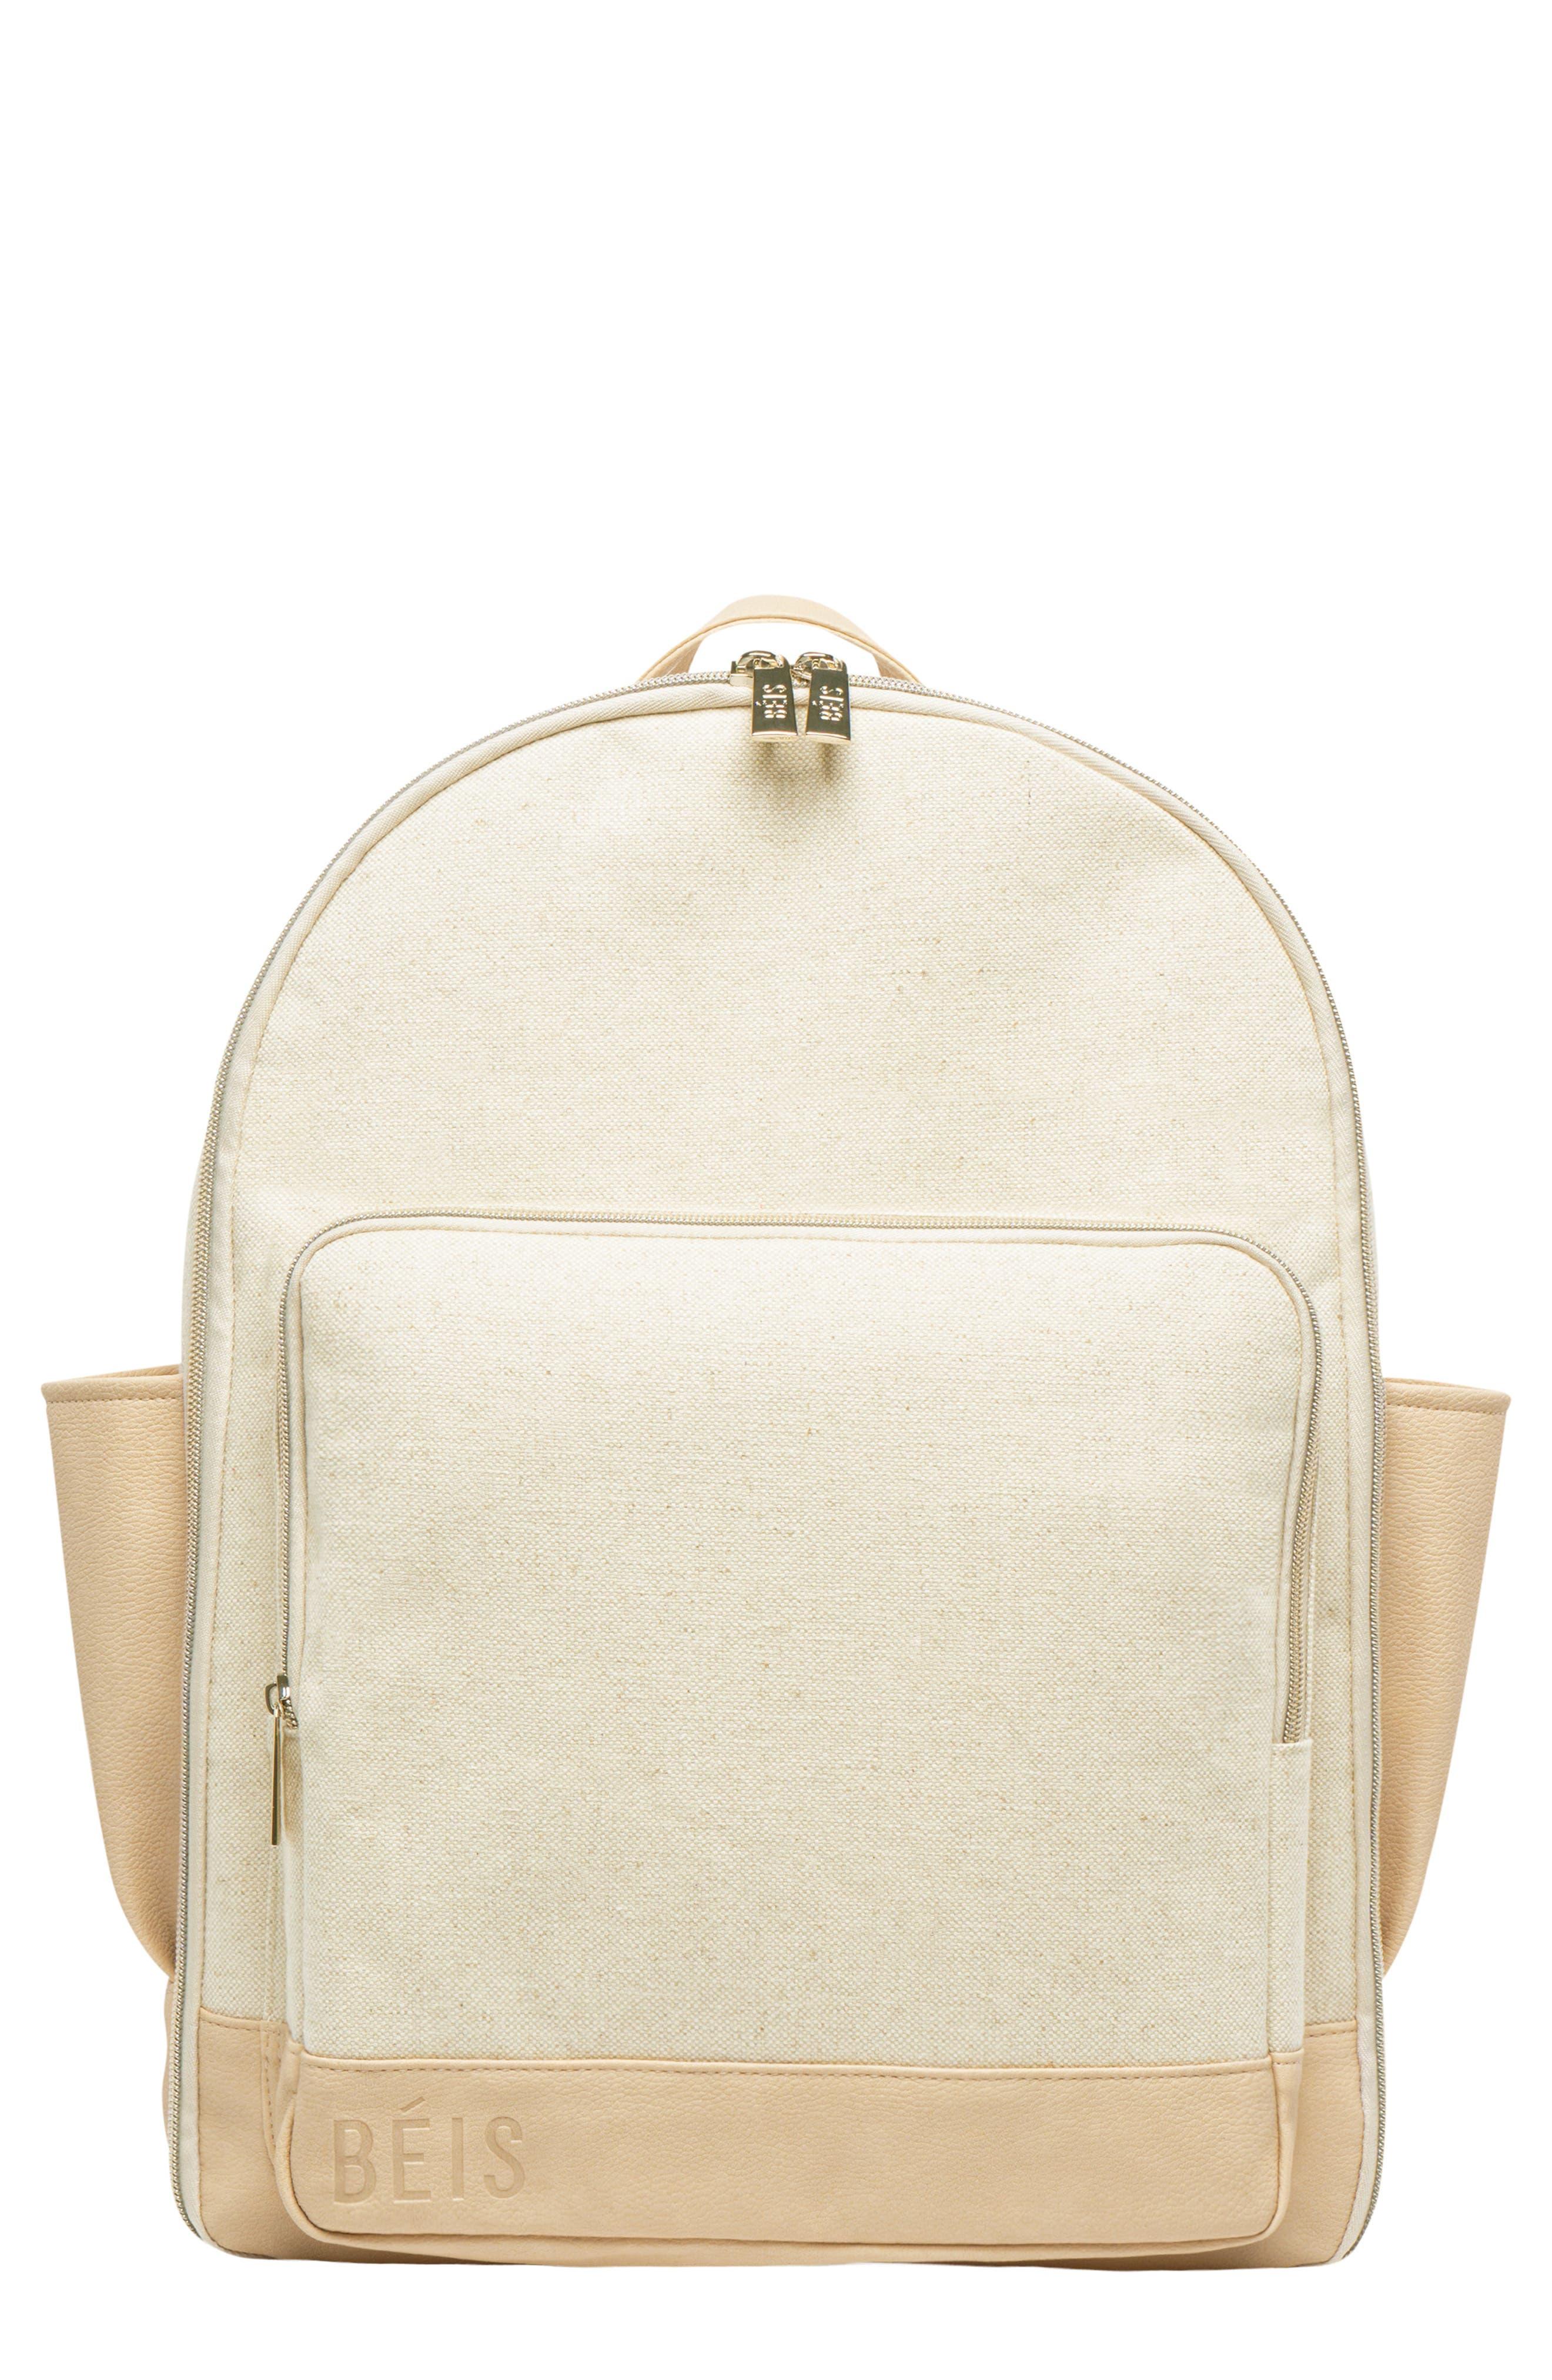 Travel Multi Function Travel Backpack,                         Main,                         color, BEIGE